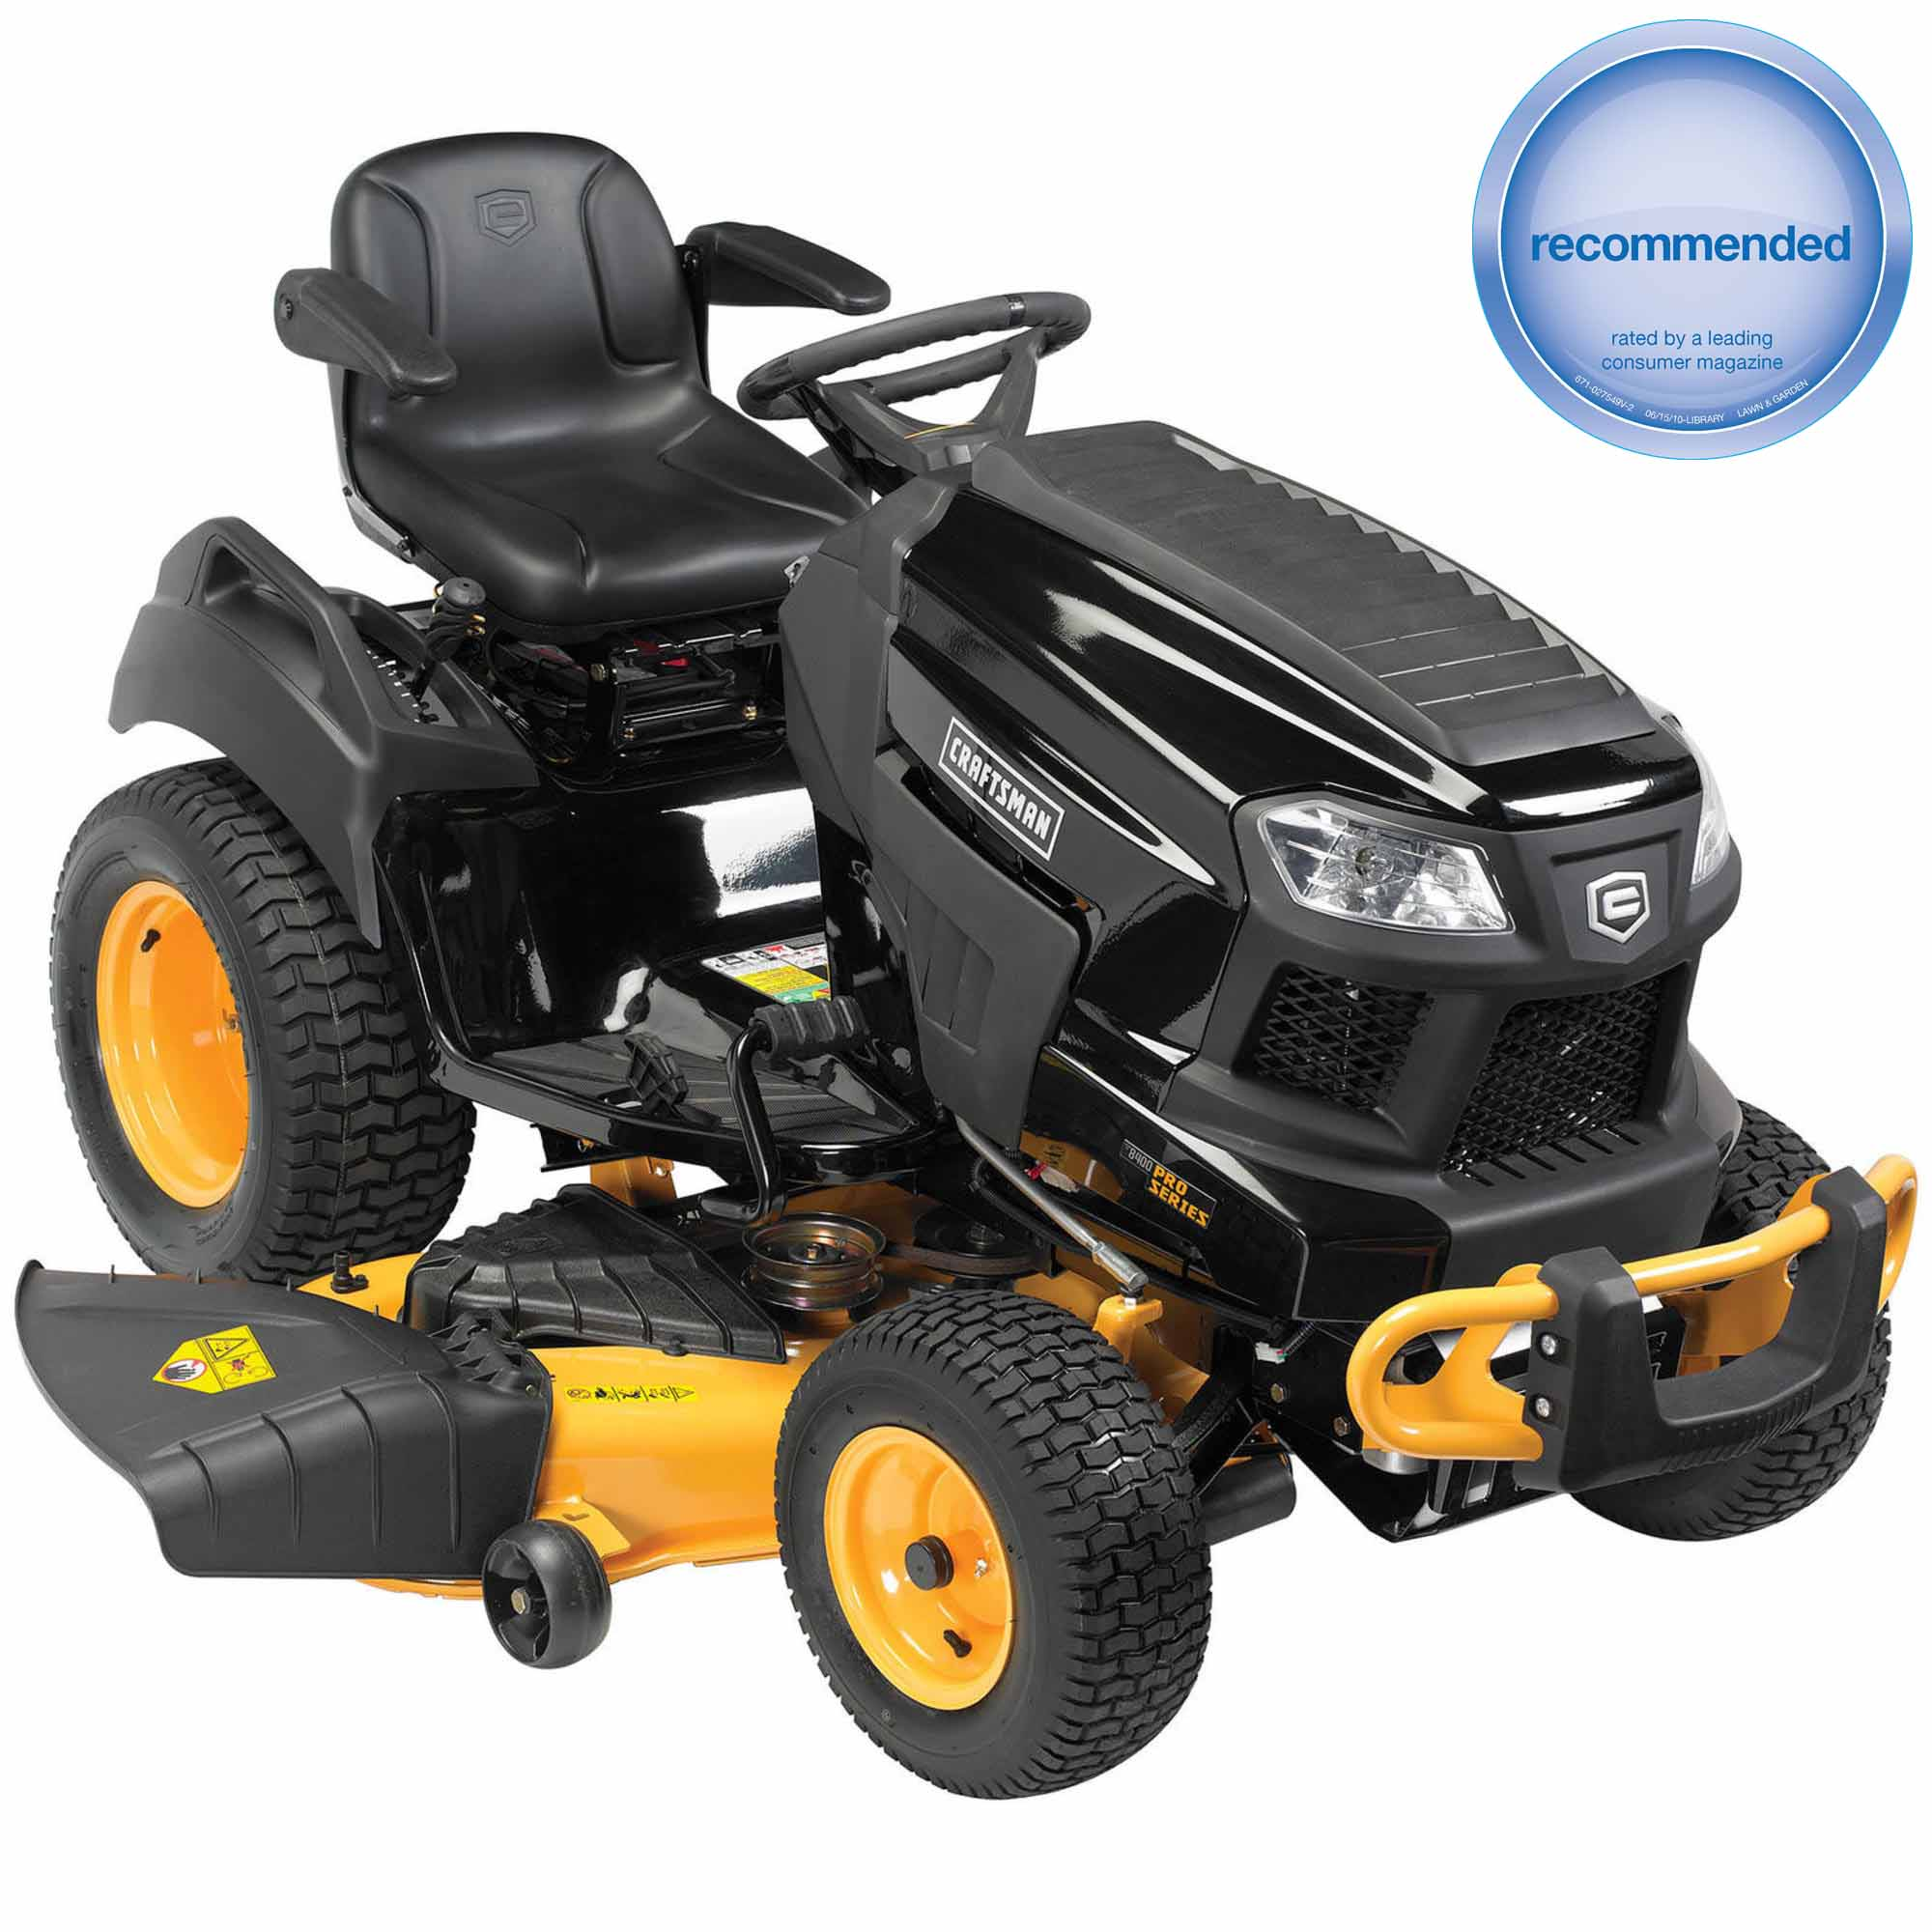 hight resolution of wheel horse garden tractors wiring diagram wheel horse toro timecutter wiring diagram ss 5000 toro